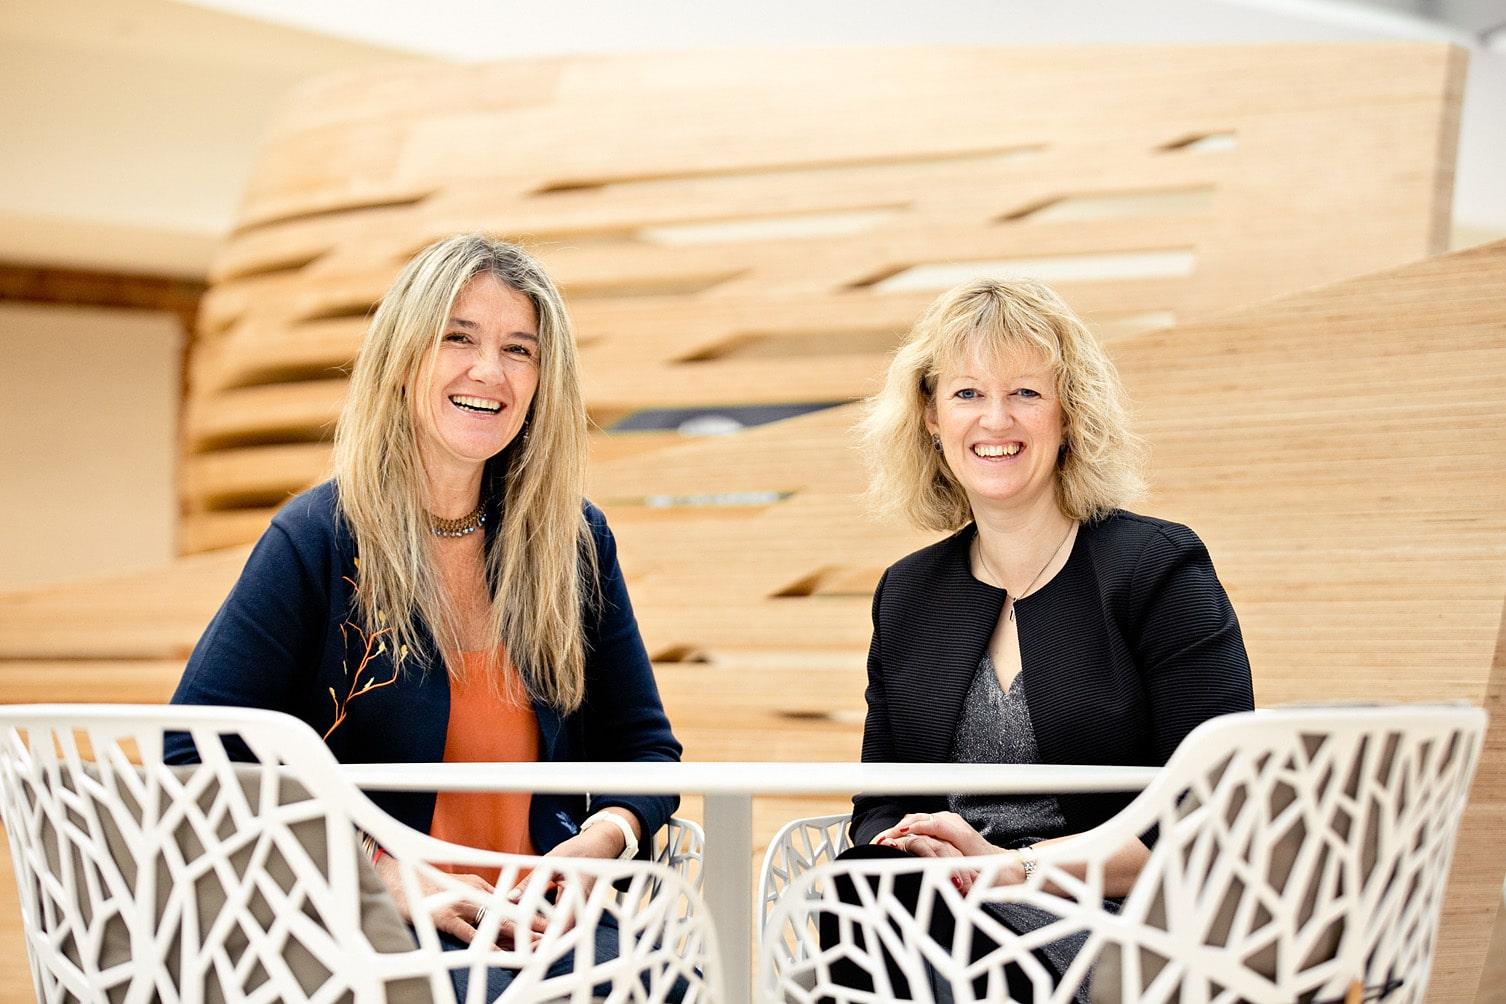 Maria Giraudo and Belinda Clarke